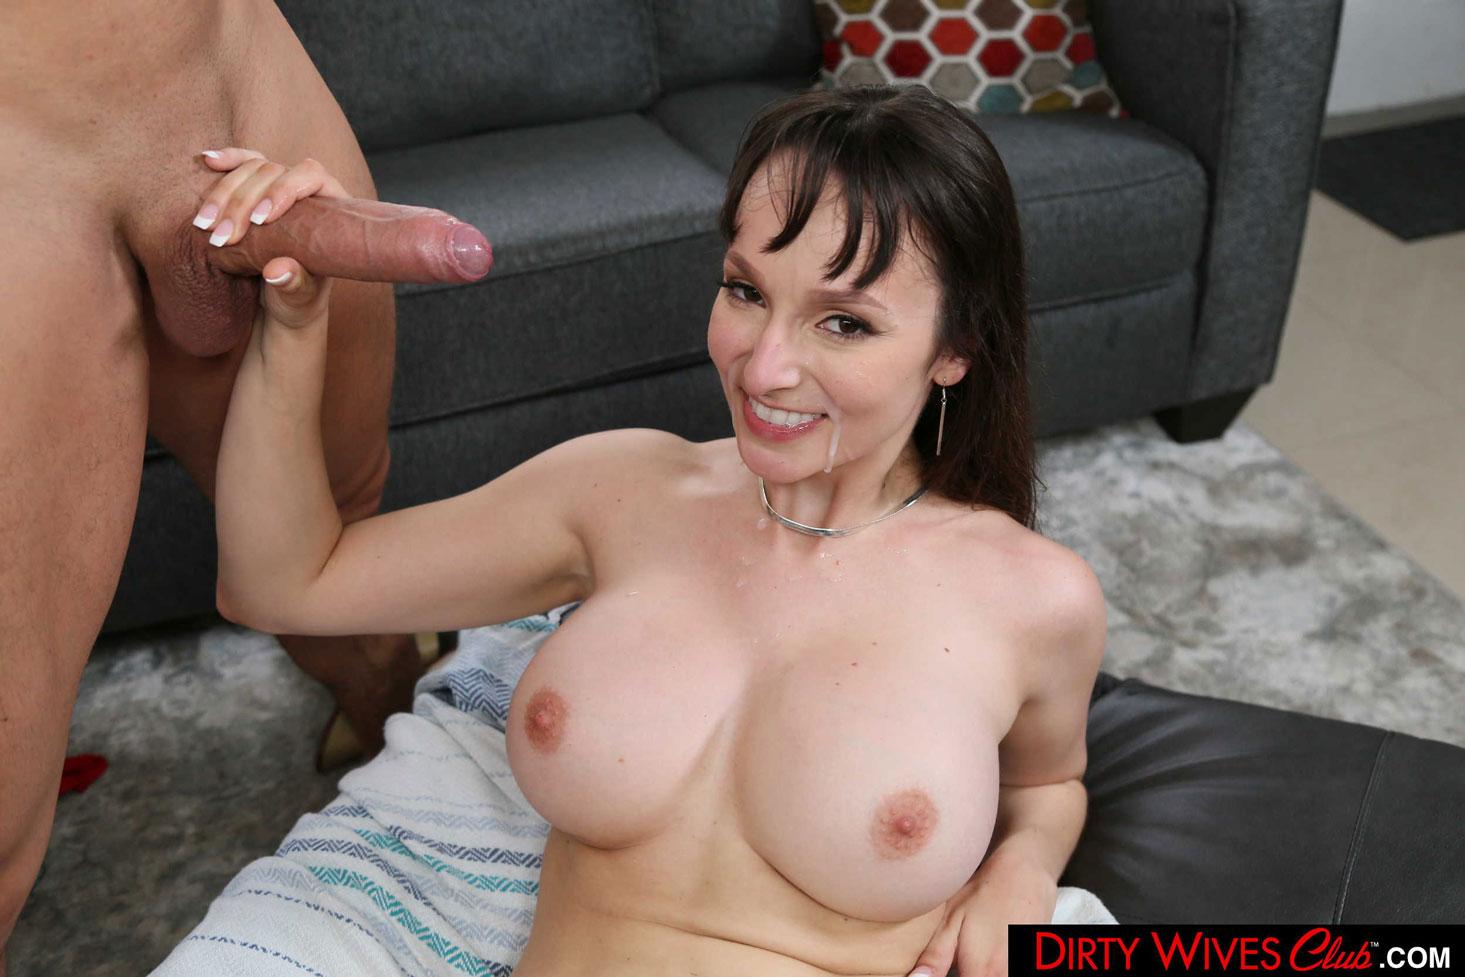 Girlsway - Lexi Luna Dirty Wife Rides Big Cock 12